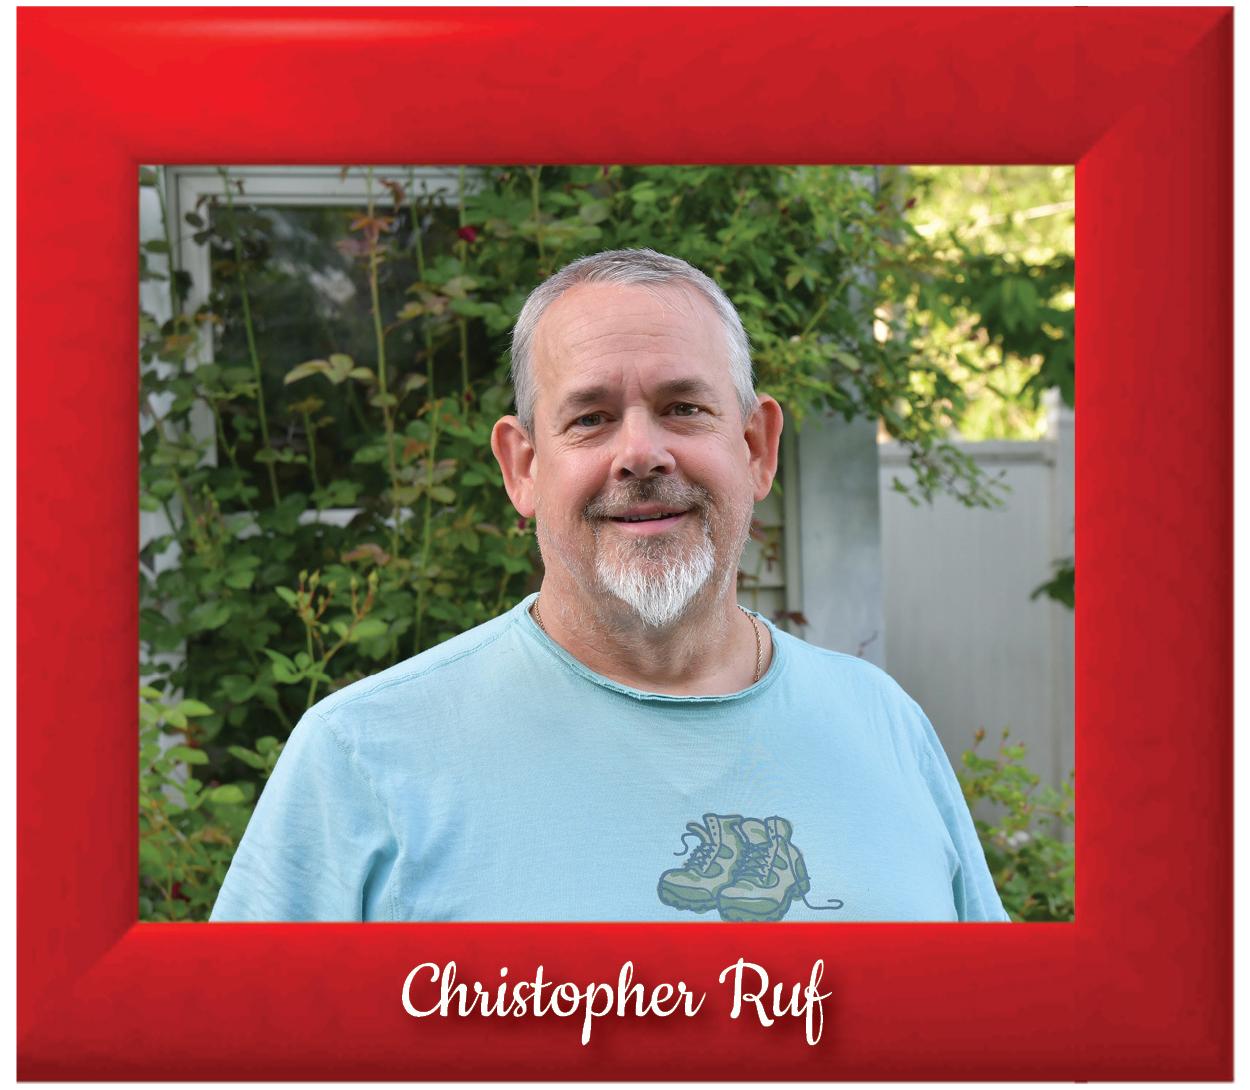 Christopher Ruf